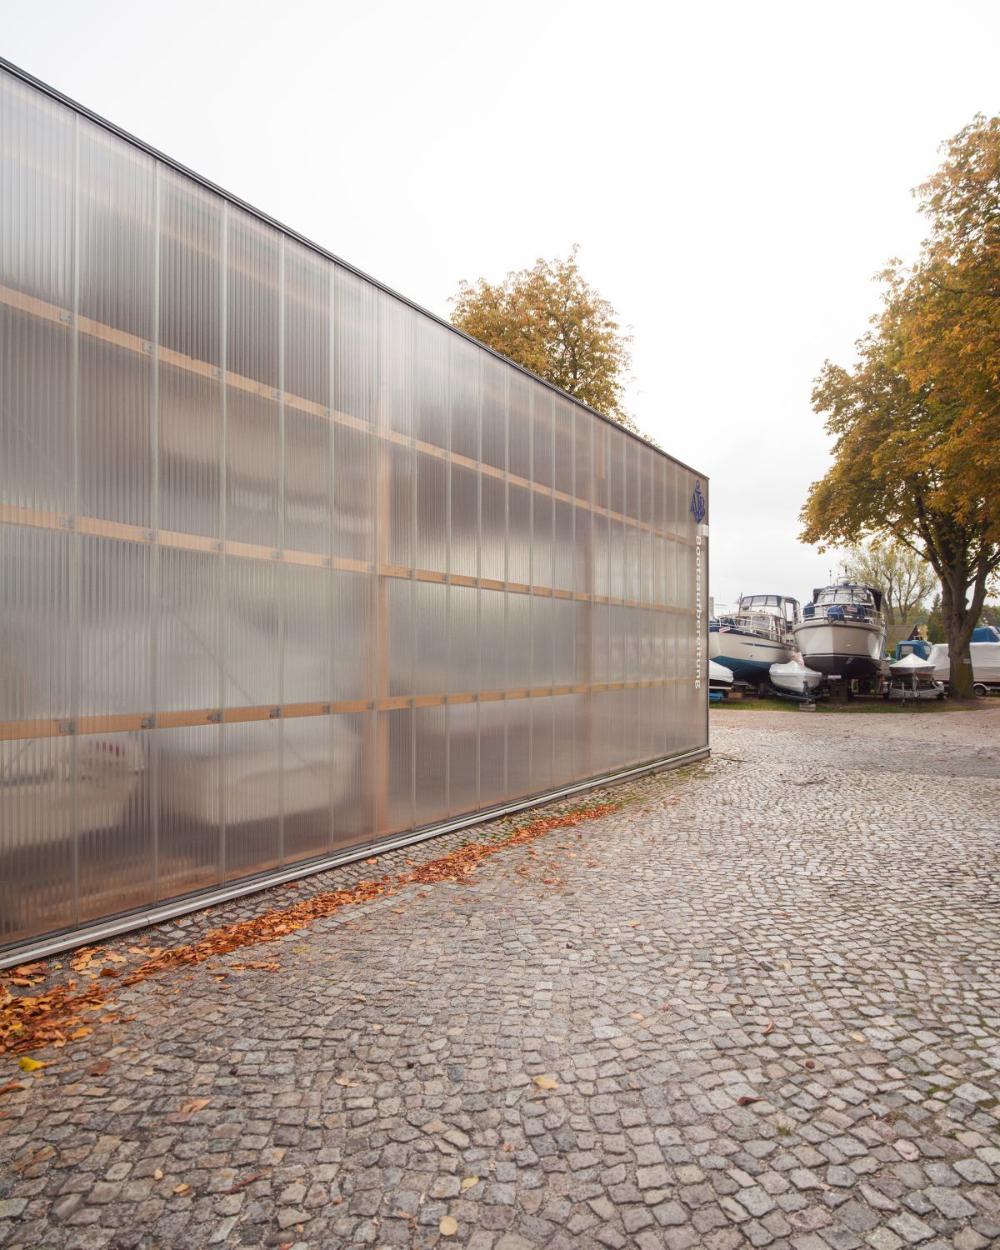 Boathouse Spandau Reiner Maria Loneke Architekten Berlin Architects Baunetz Architects Profile Baunetz Architek Bootshaus Architektur Garage Gastehaus